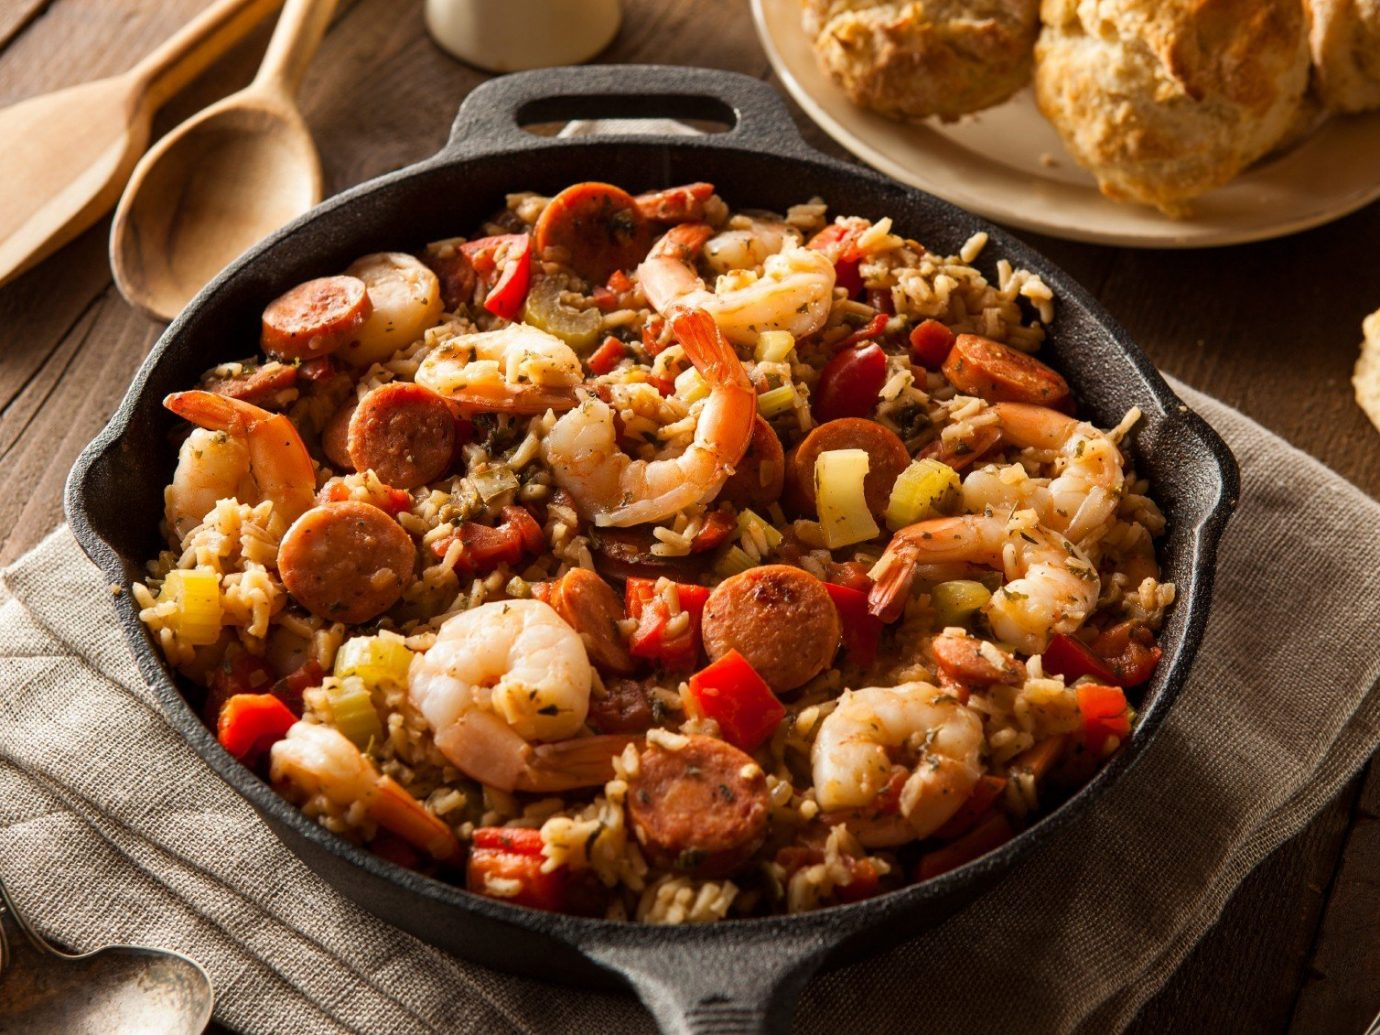 Jetsetter Guides food dish cuisine produce meat vegetable jambalaya european food meal several